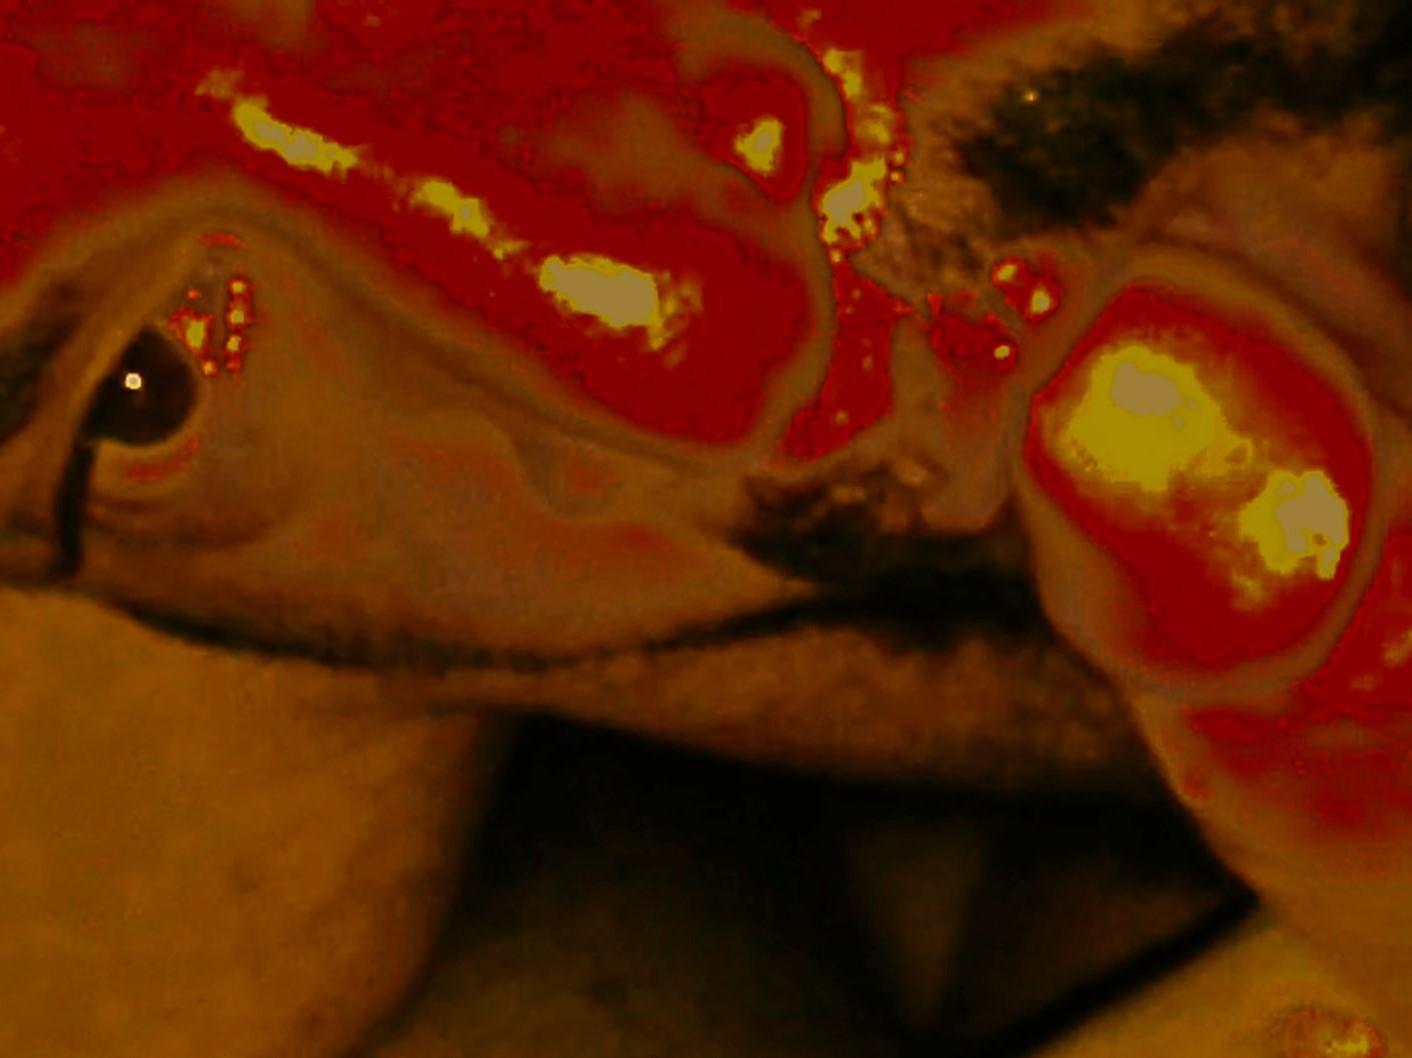 Rodrigo Batista: THE B-SIDE (video-propaganda-art).